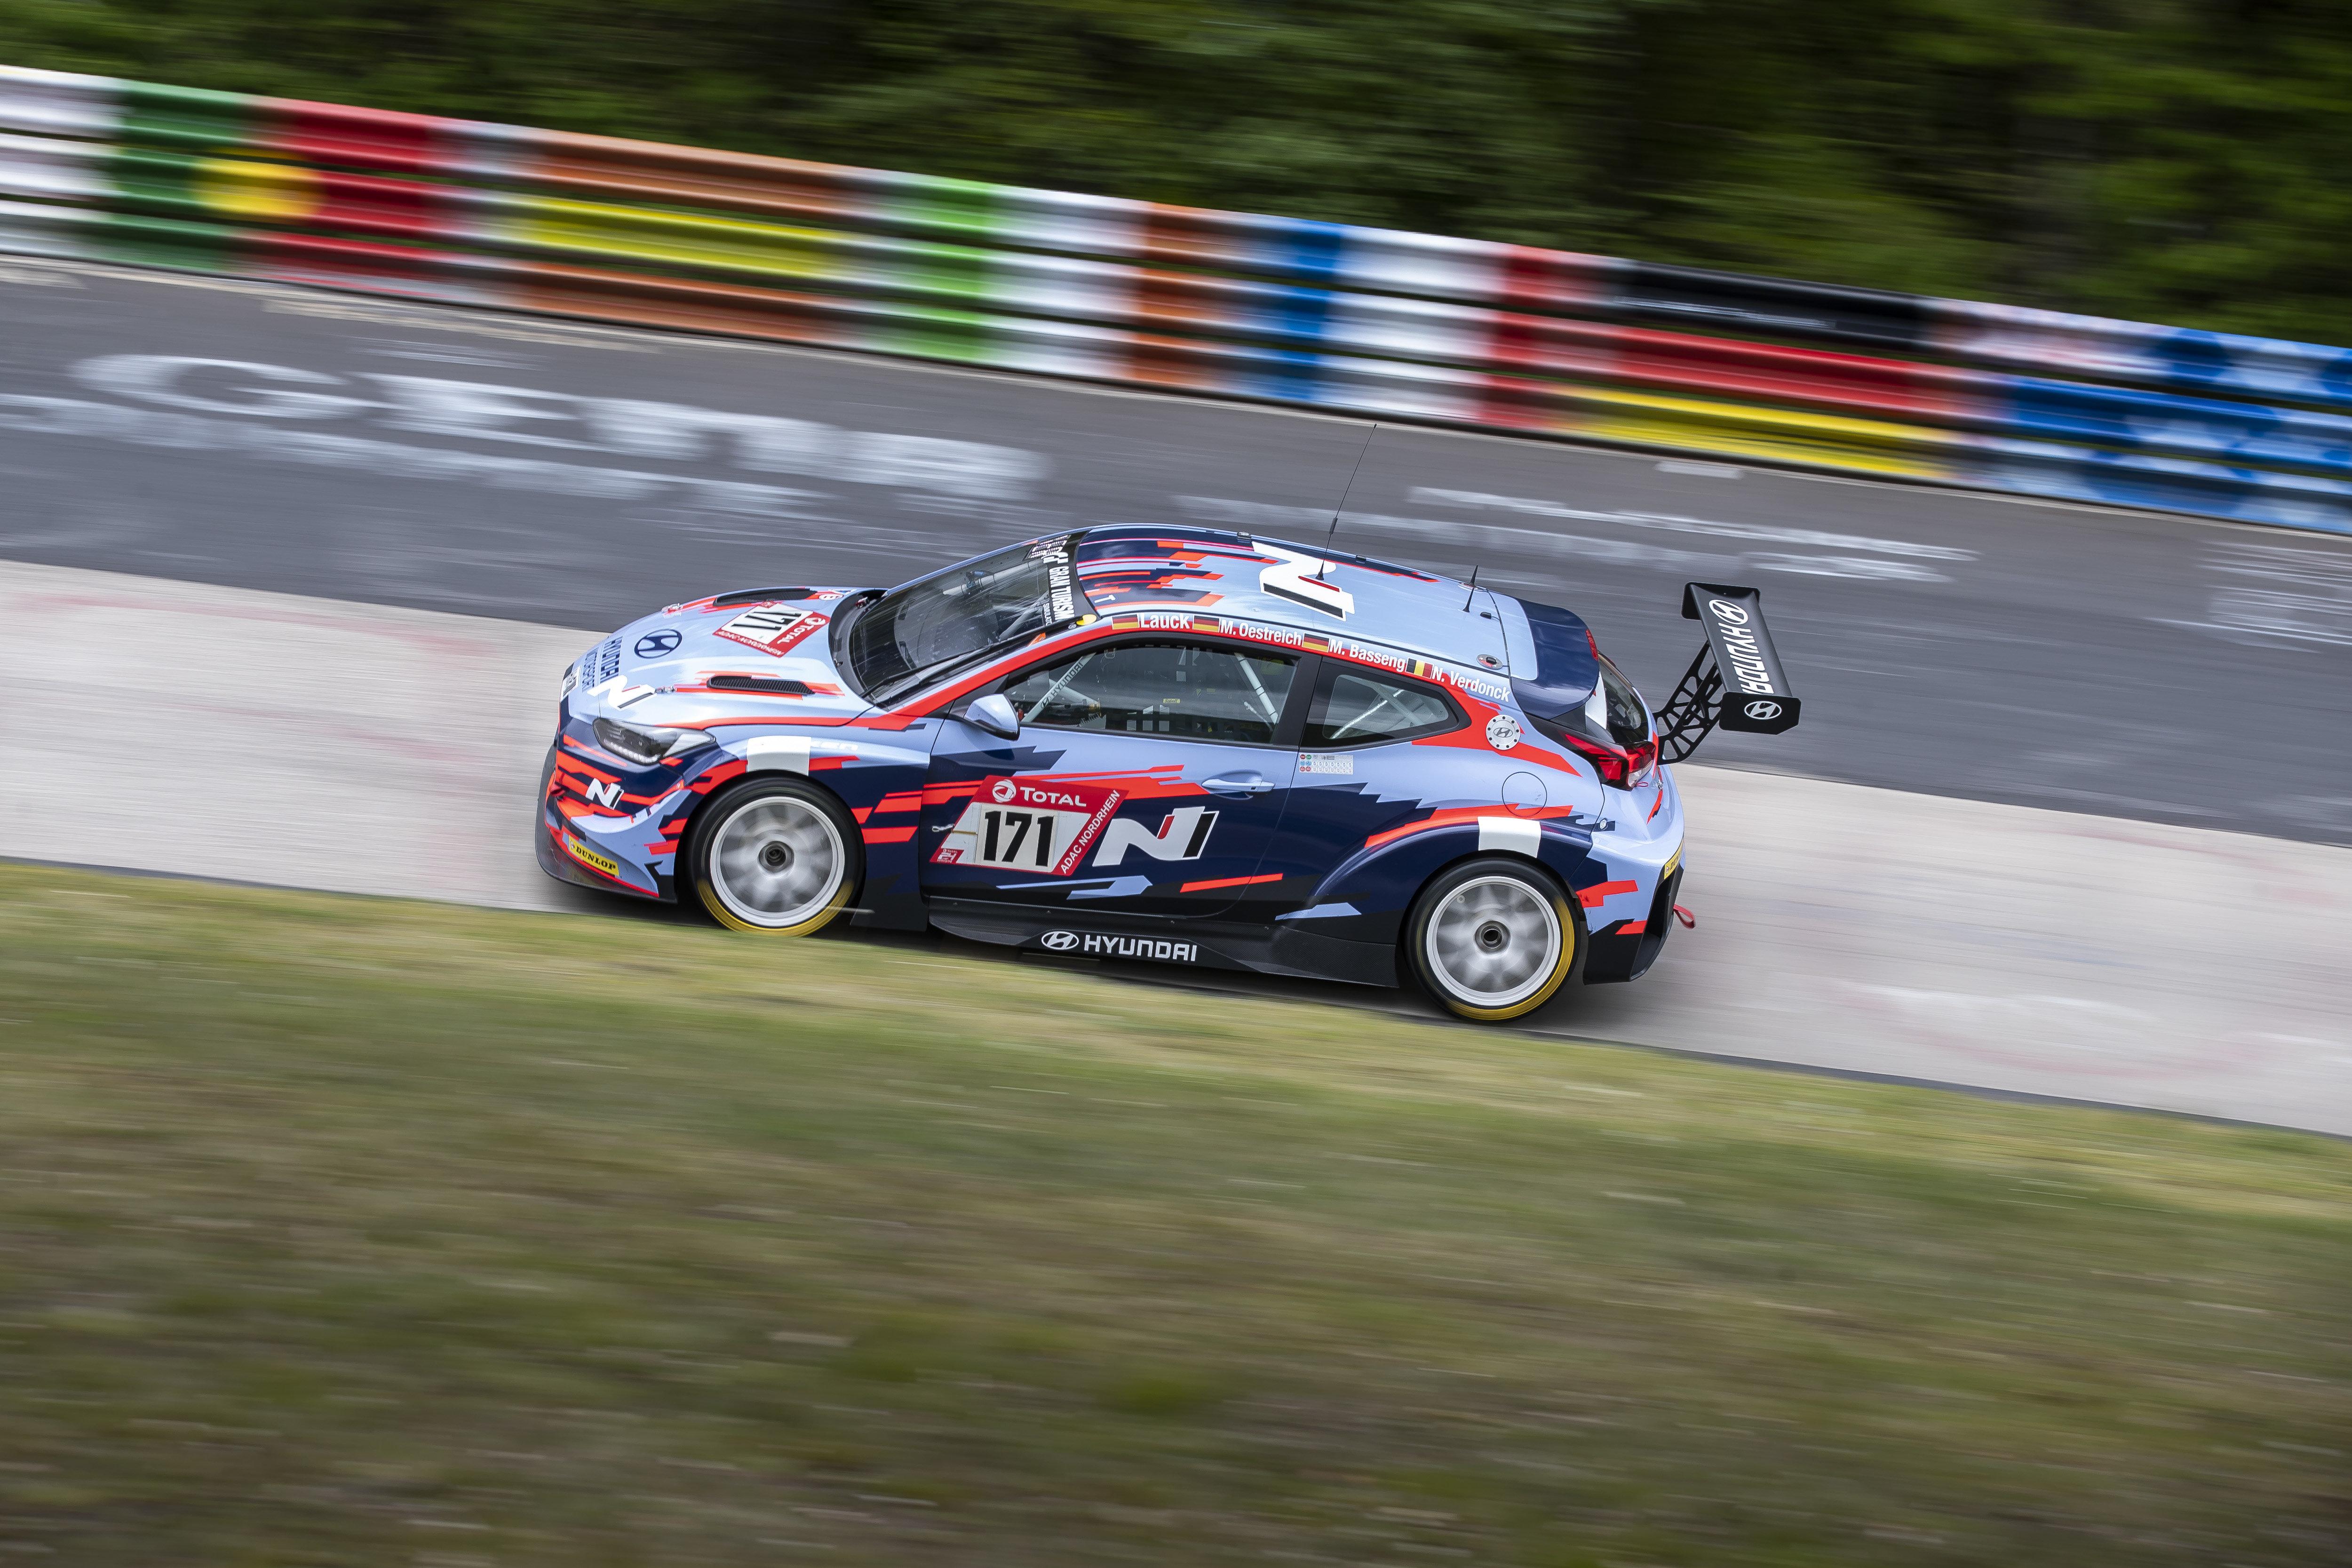 Veloster N TCR - Nürburgring 24 Hours Qualifying Race